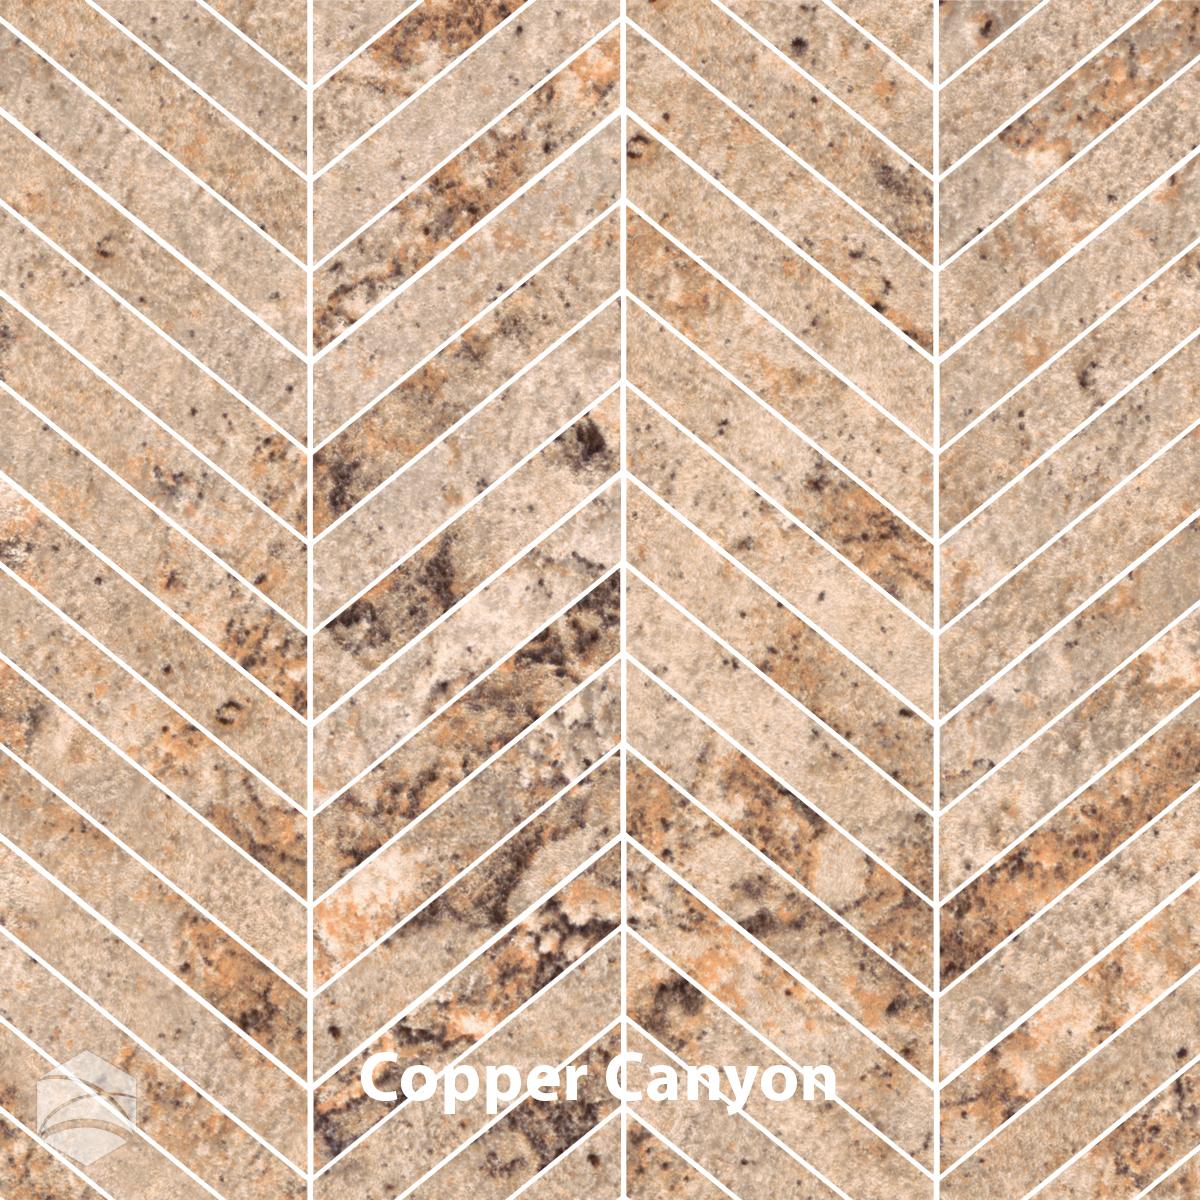 Copper Canyon_chevron_V2_12x12.jpg